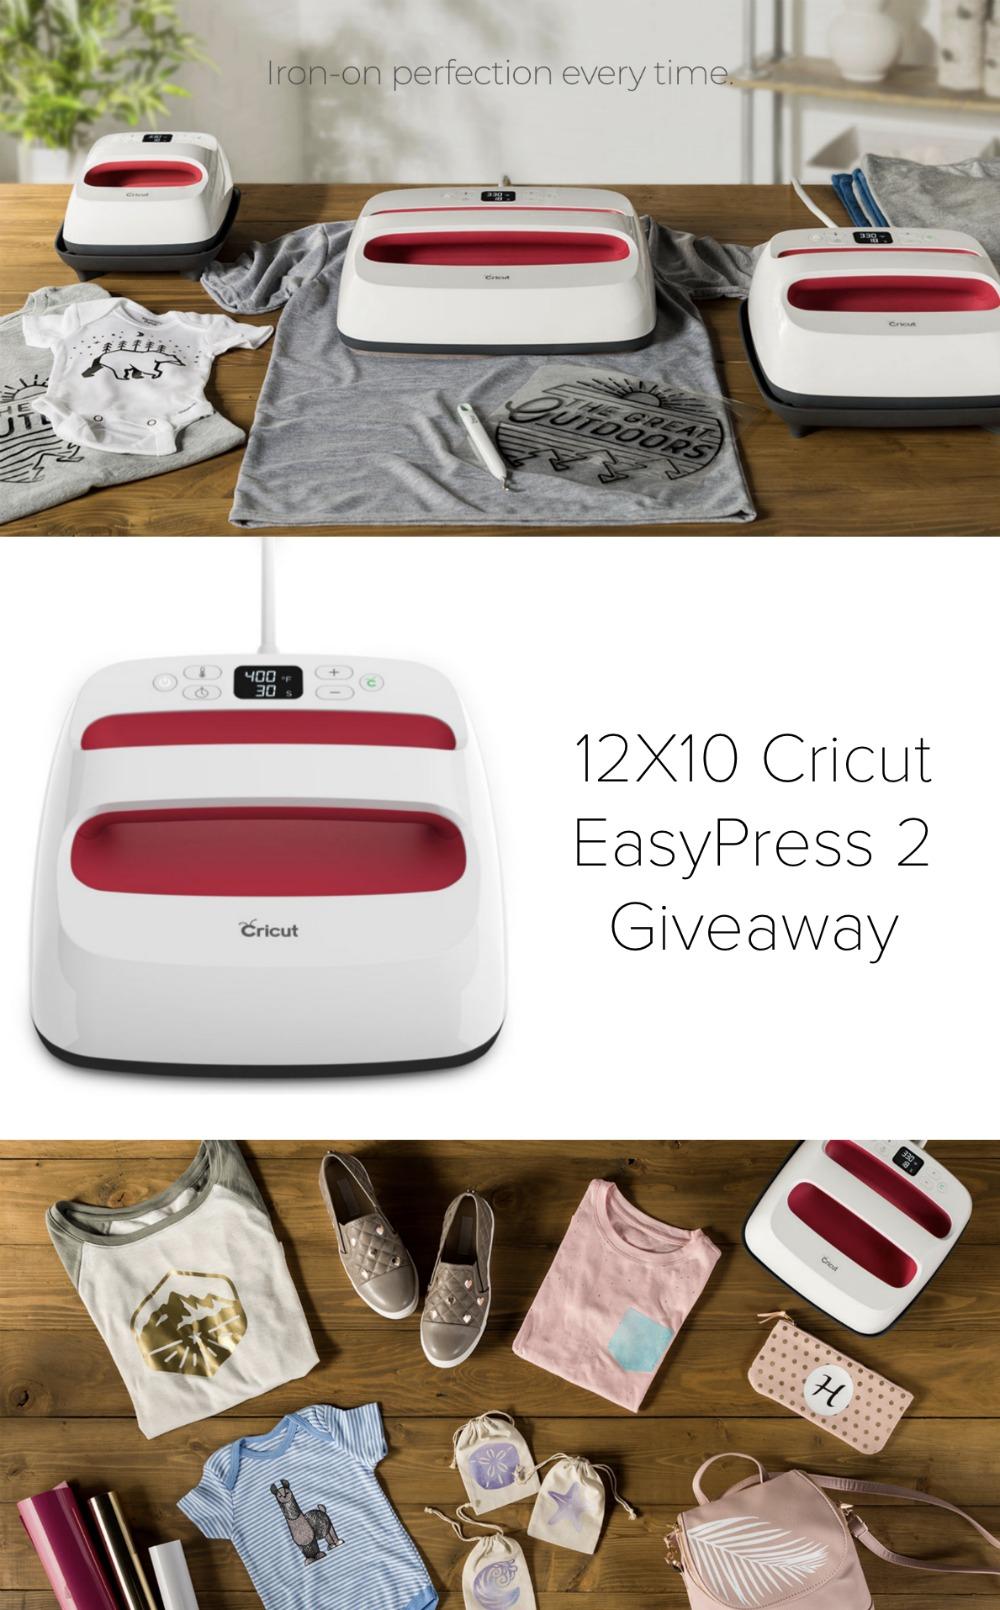 12X10 Cricut EasyPress 2 Giveaway.jpg